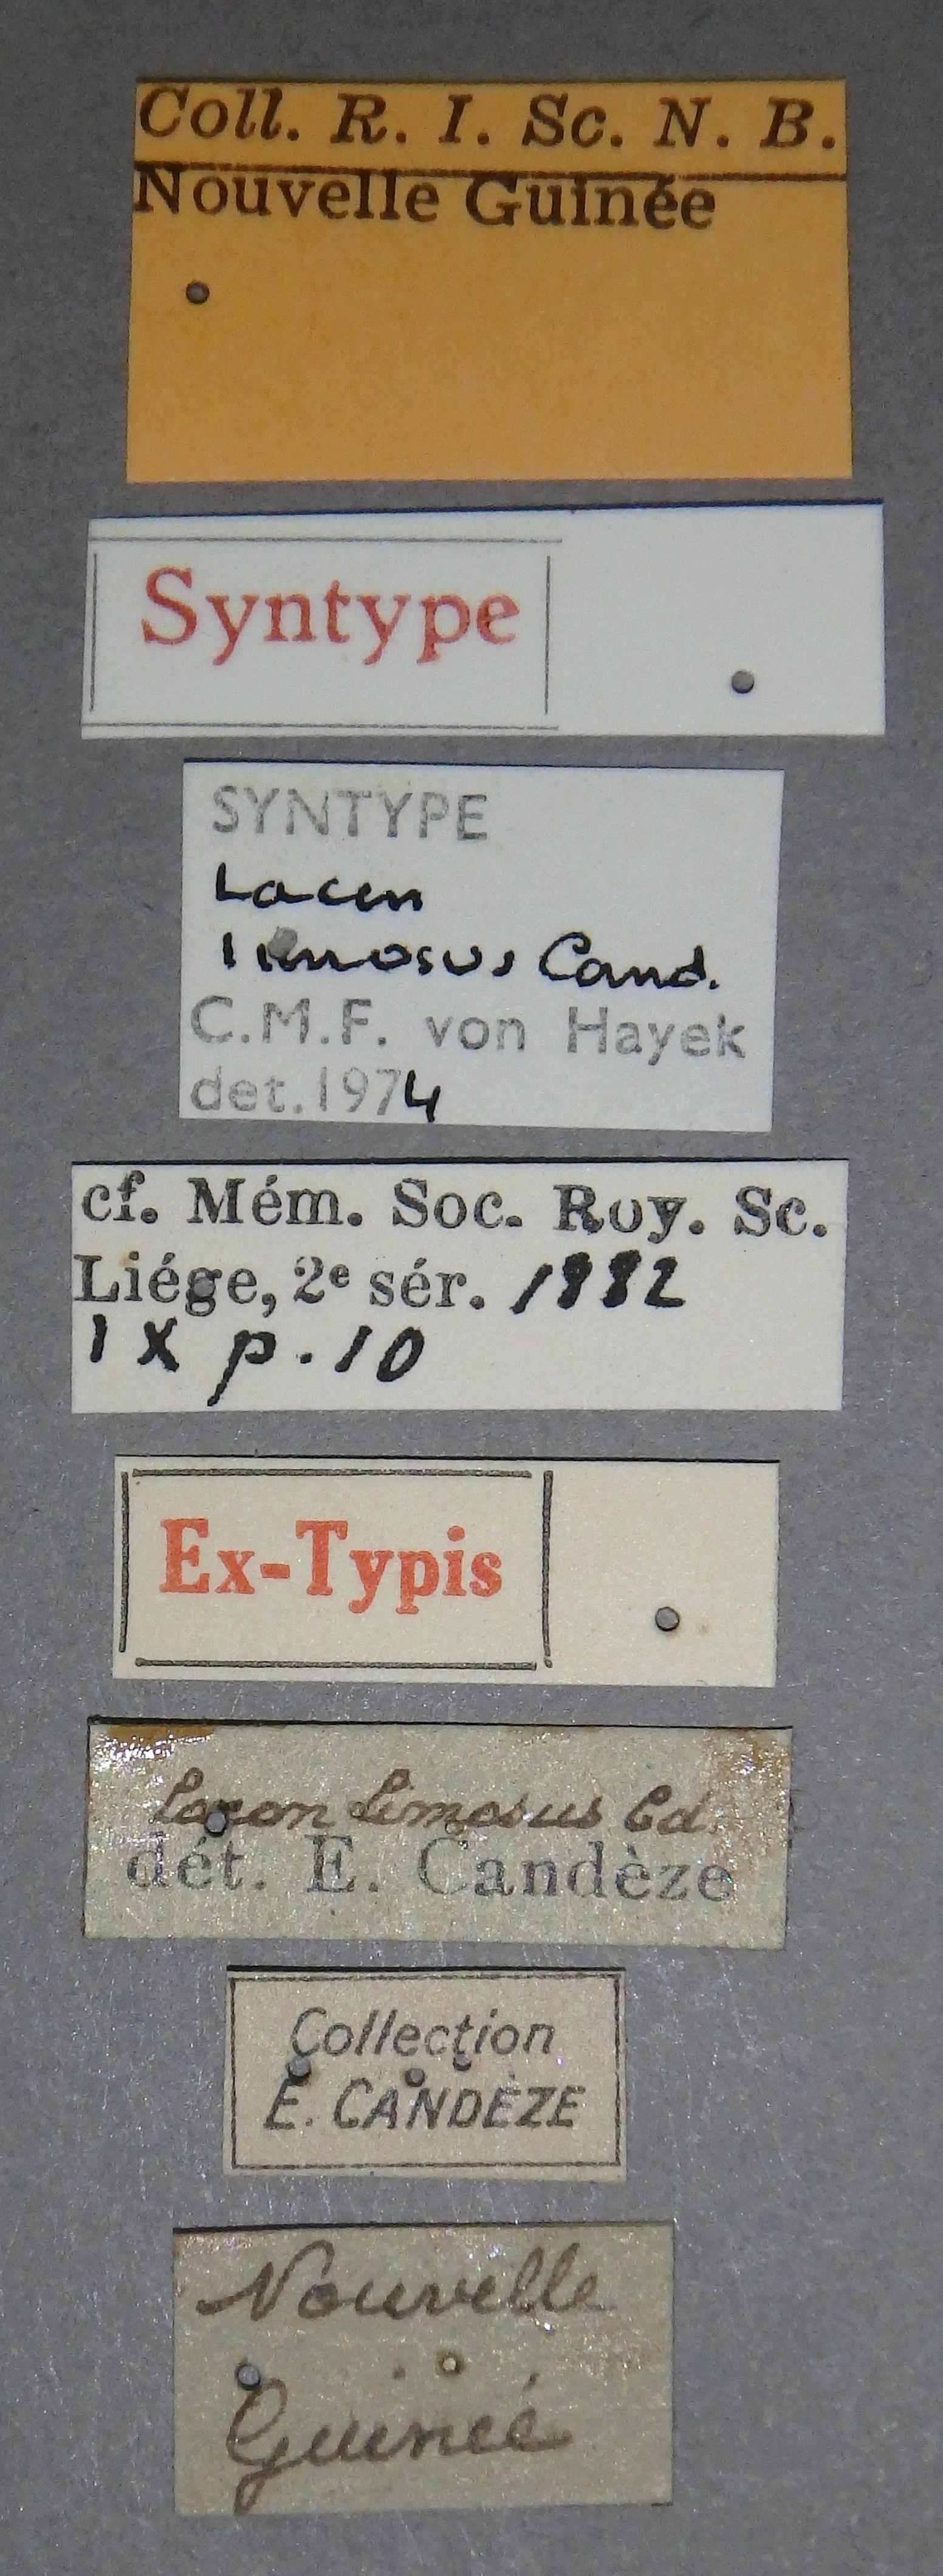 lacon limosus st2 Lb.JPG